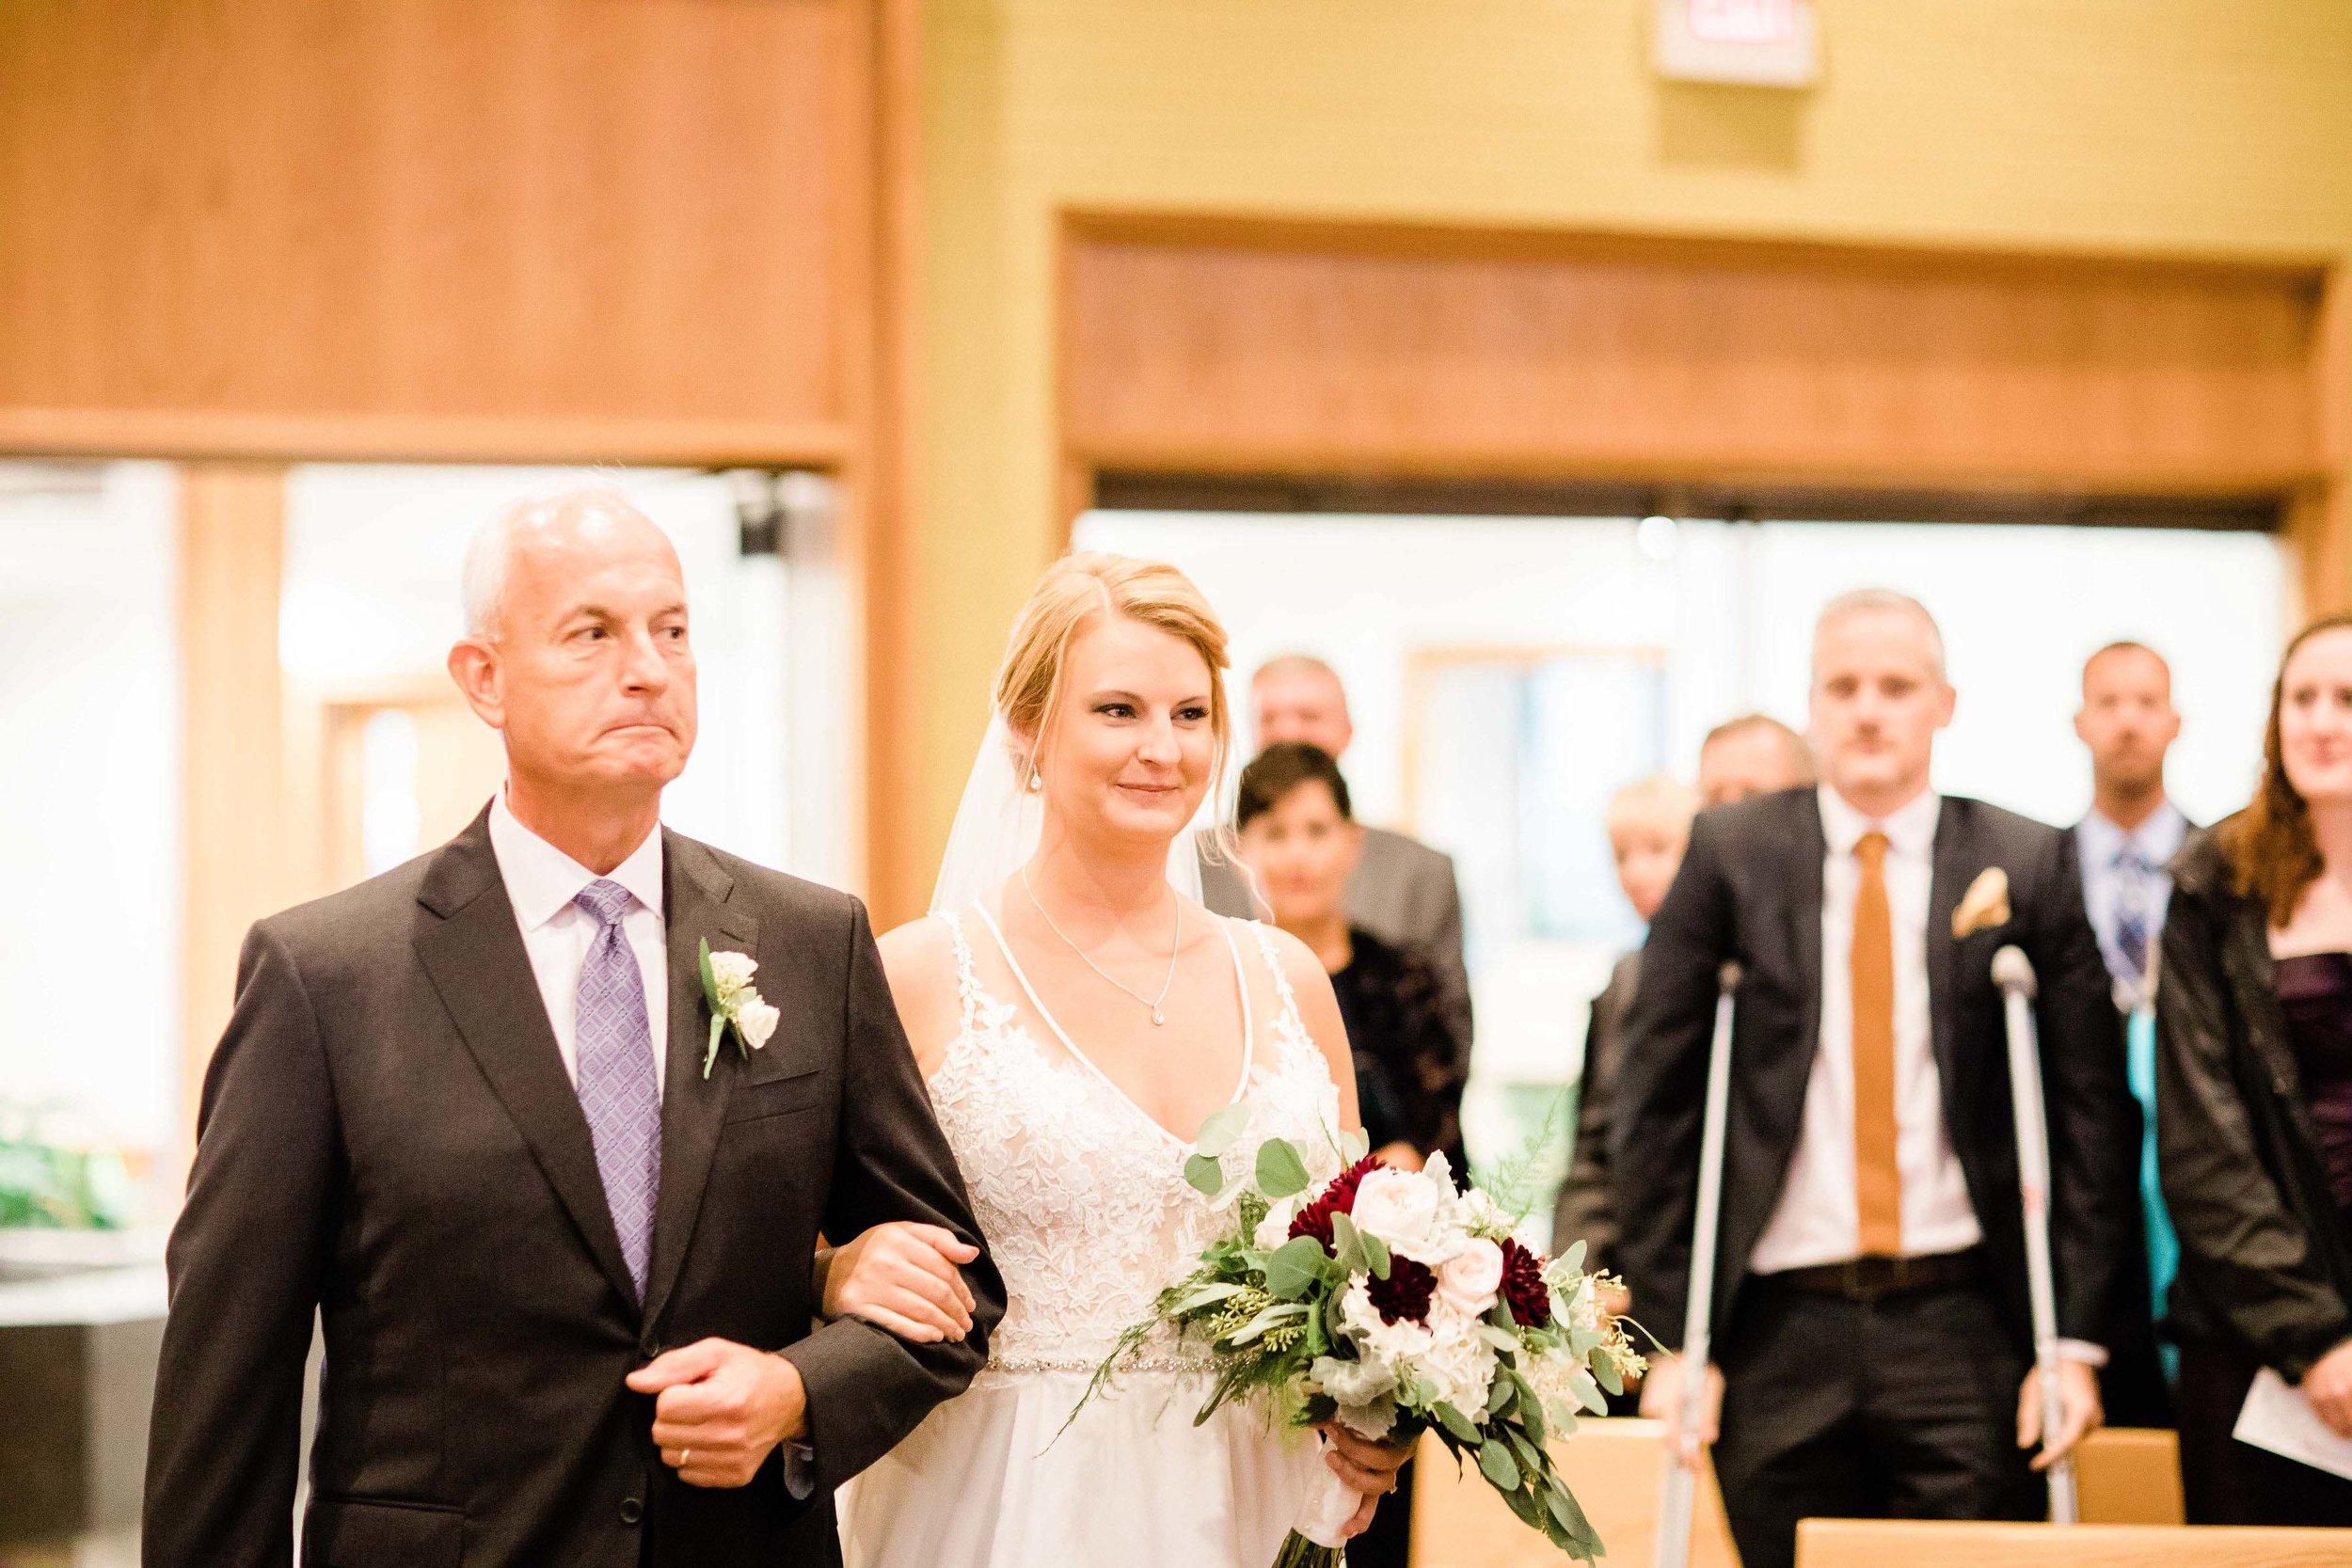 bellarmine chapel wedding ceremony-1.jpg